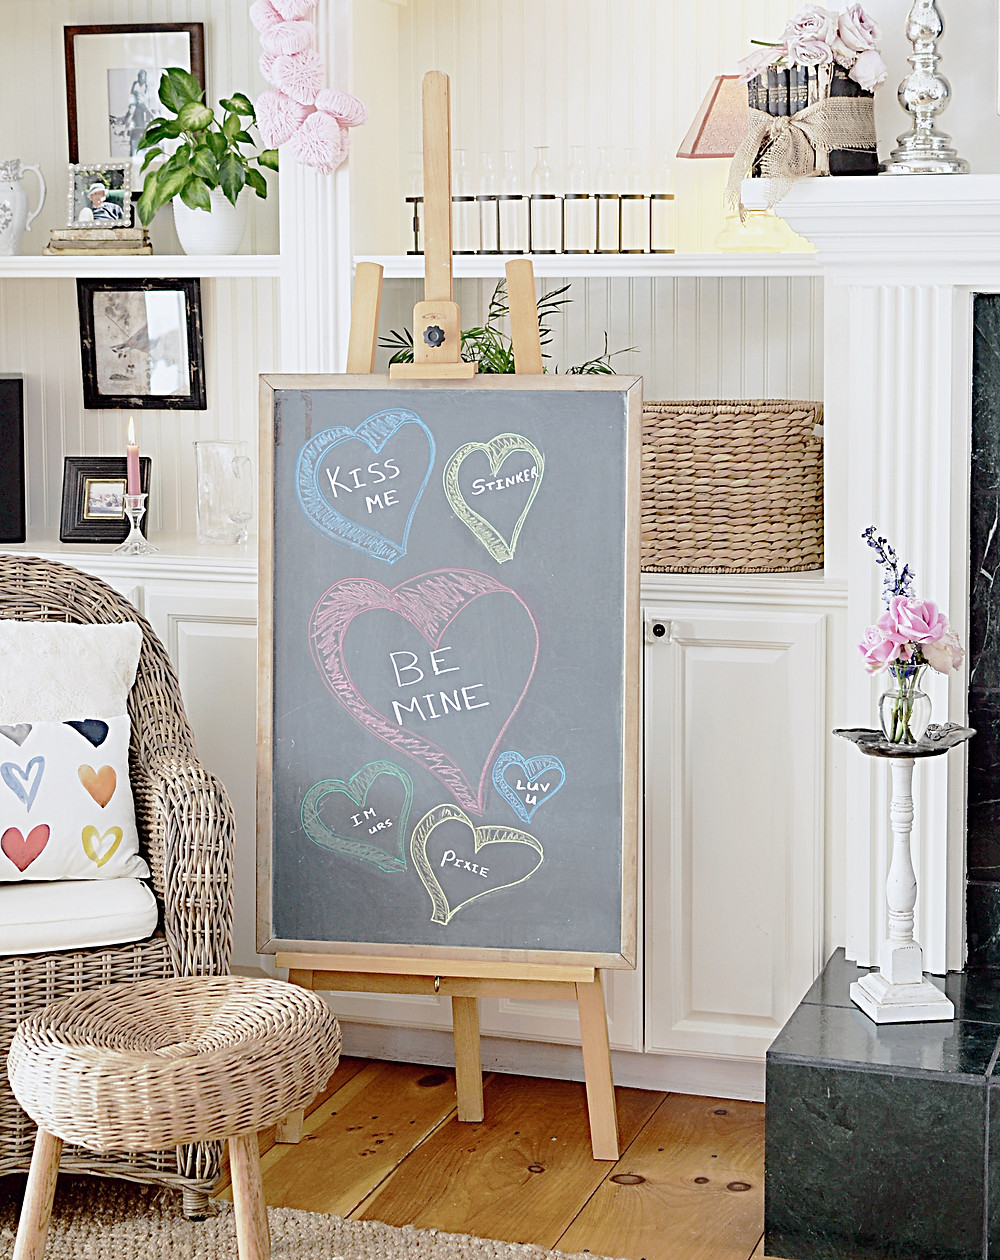 Vintage Home Decor for Valentine's Day